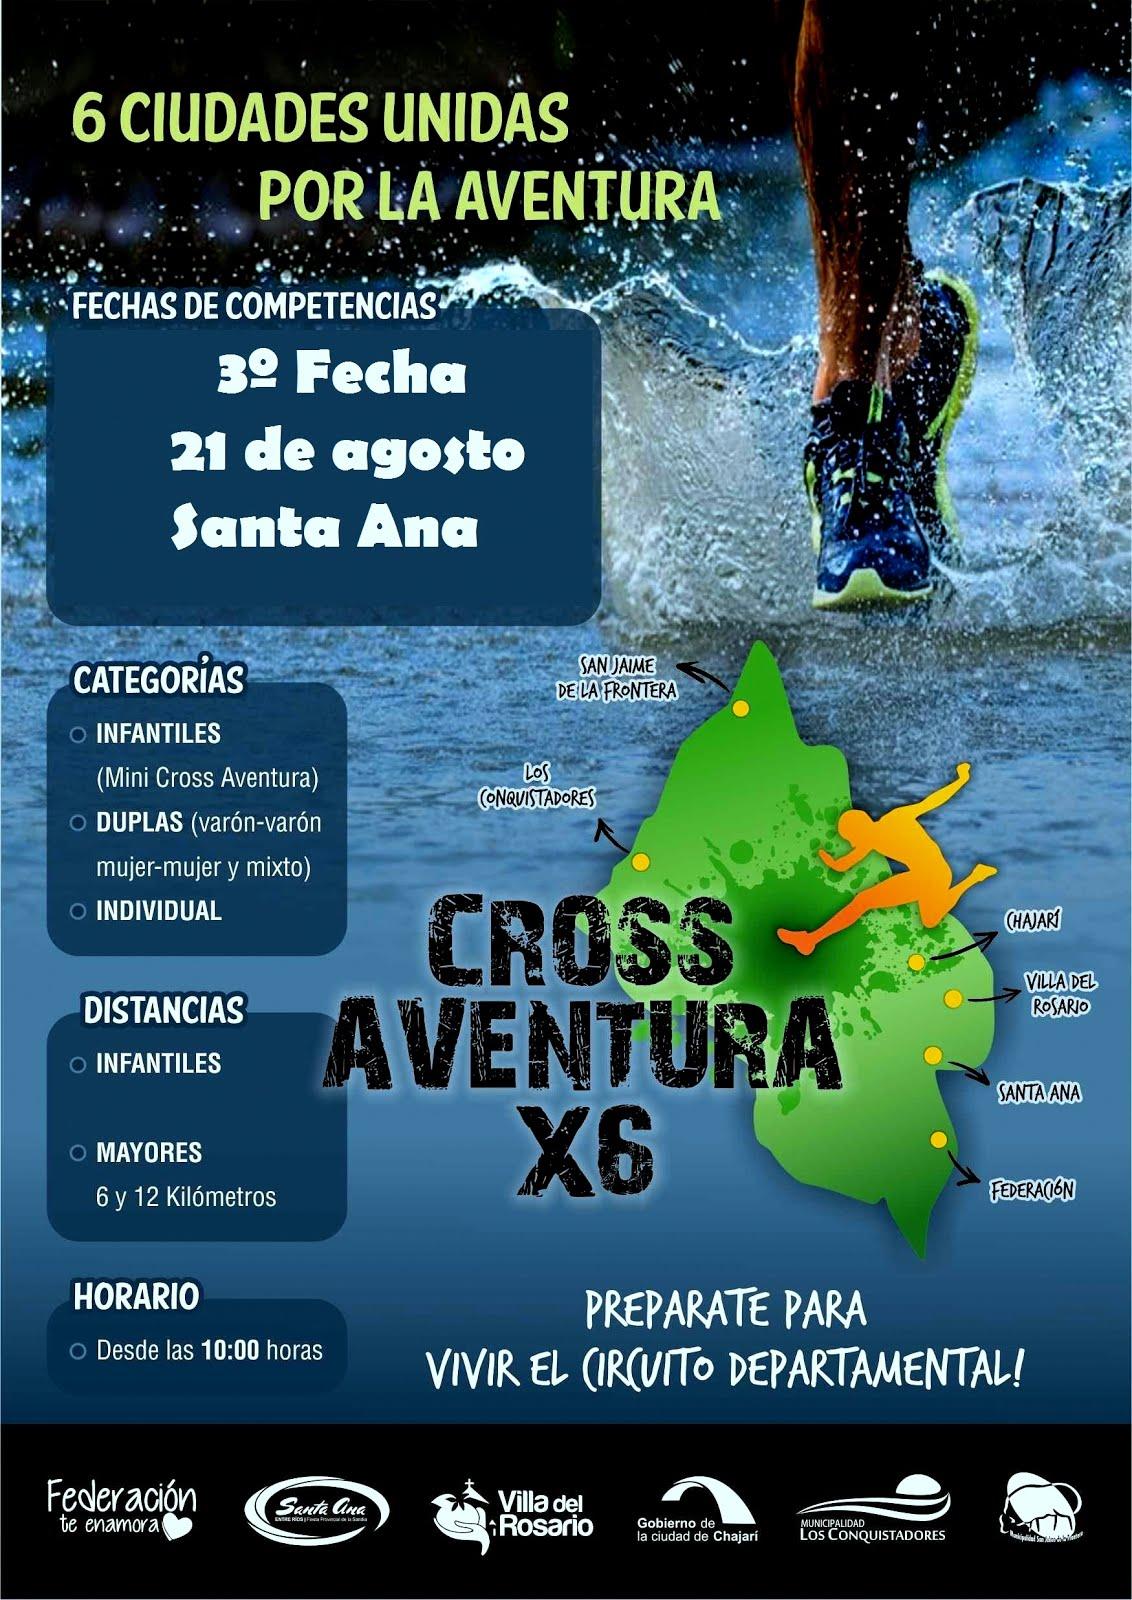 2º FECHA CROSS X 6 AVENTURA